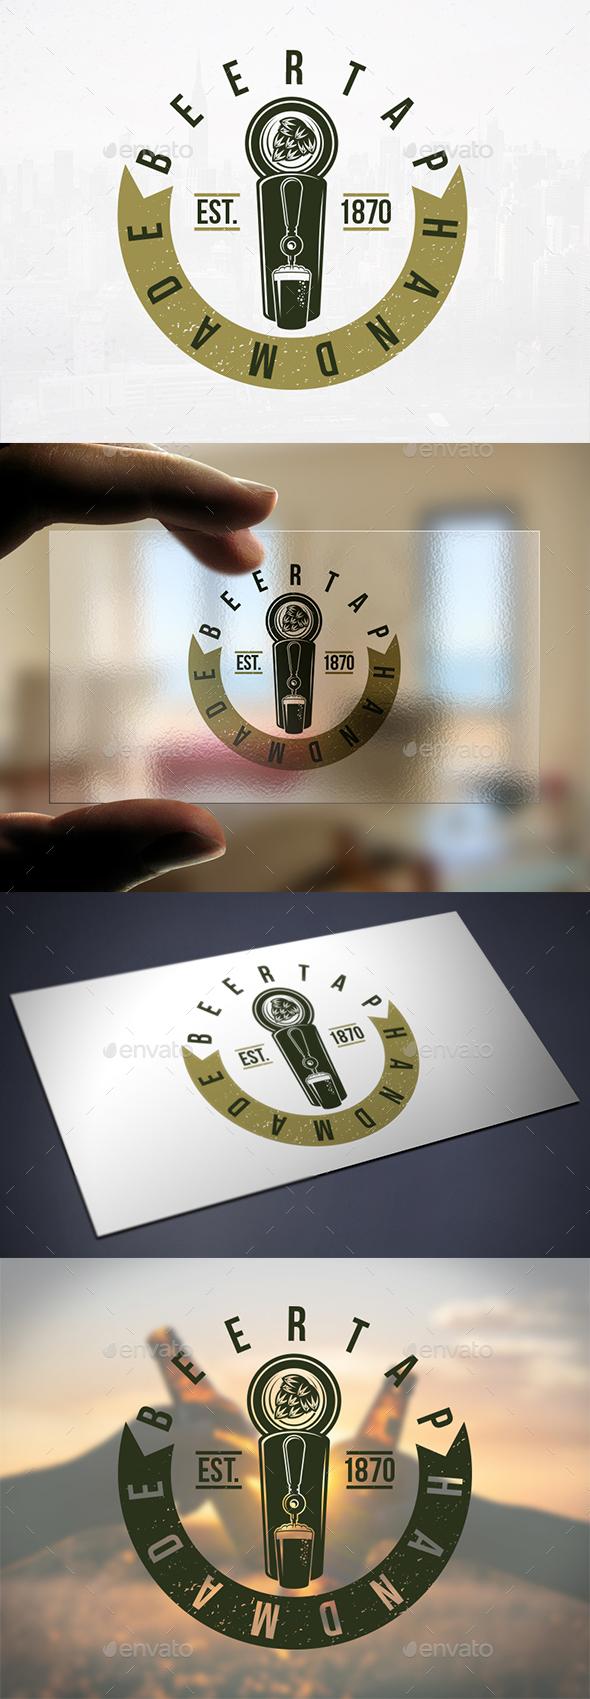 Crest logos from graphicriver altavistaventures Images